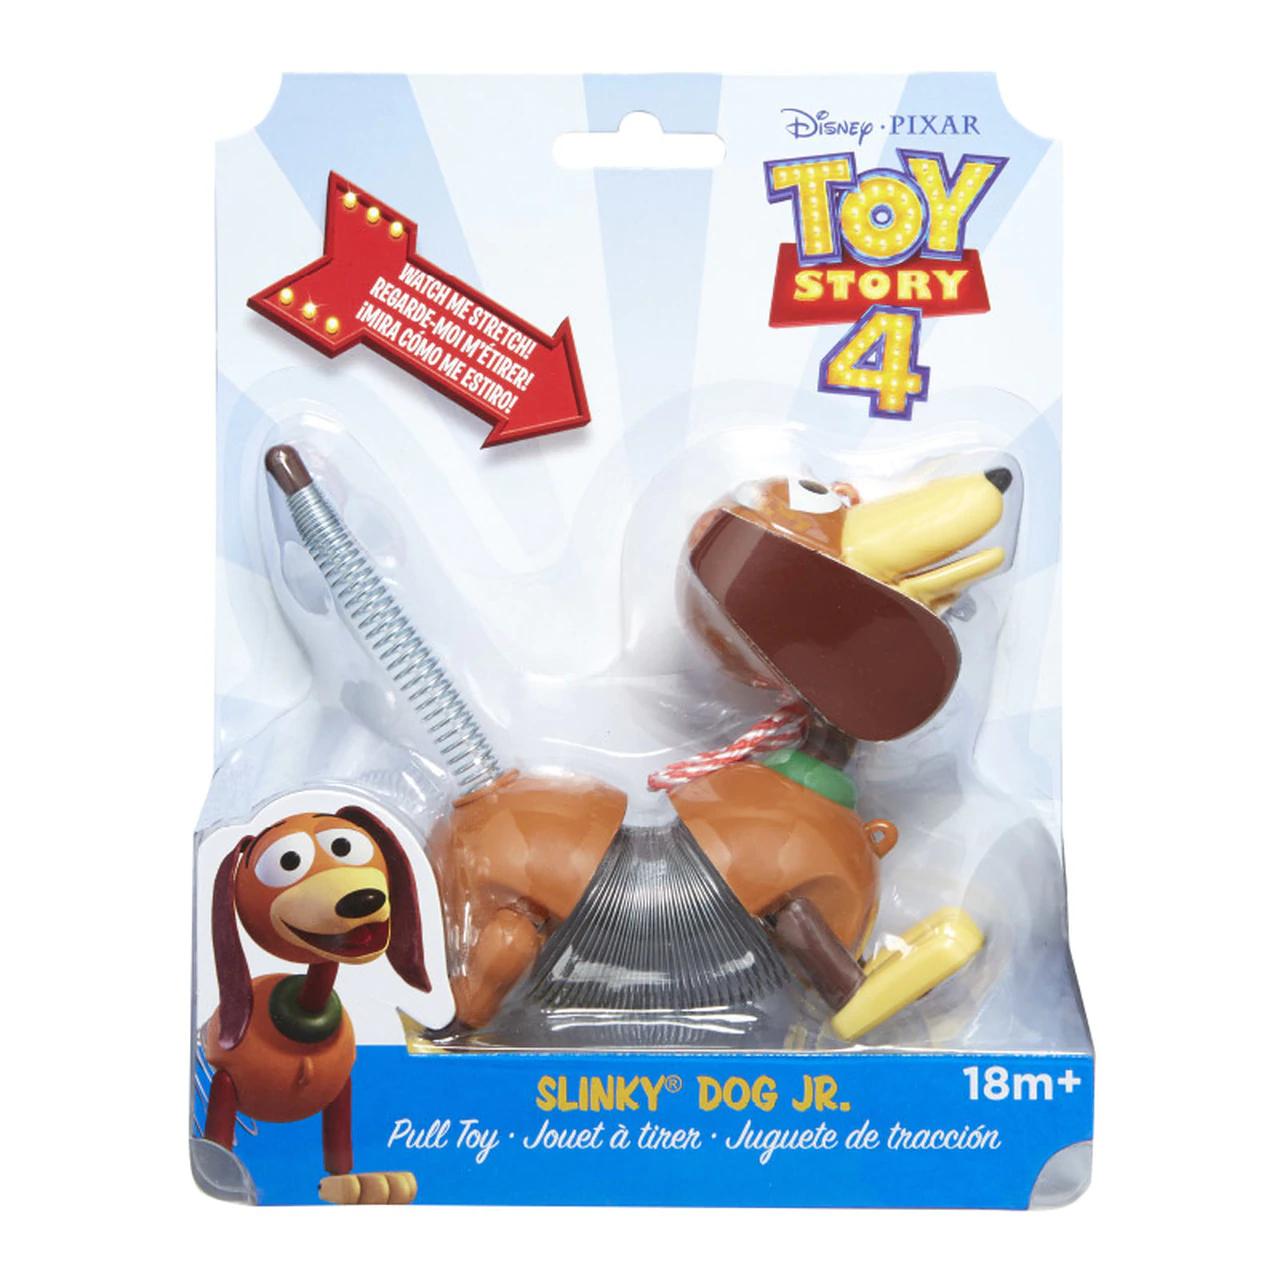 Toy story 4 slinky scanning as £1 instore @ Asda Hunts Cross Liverpool